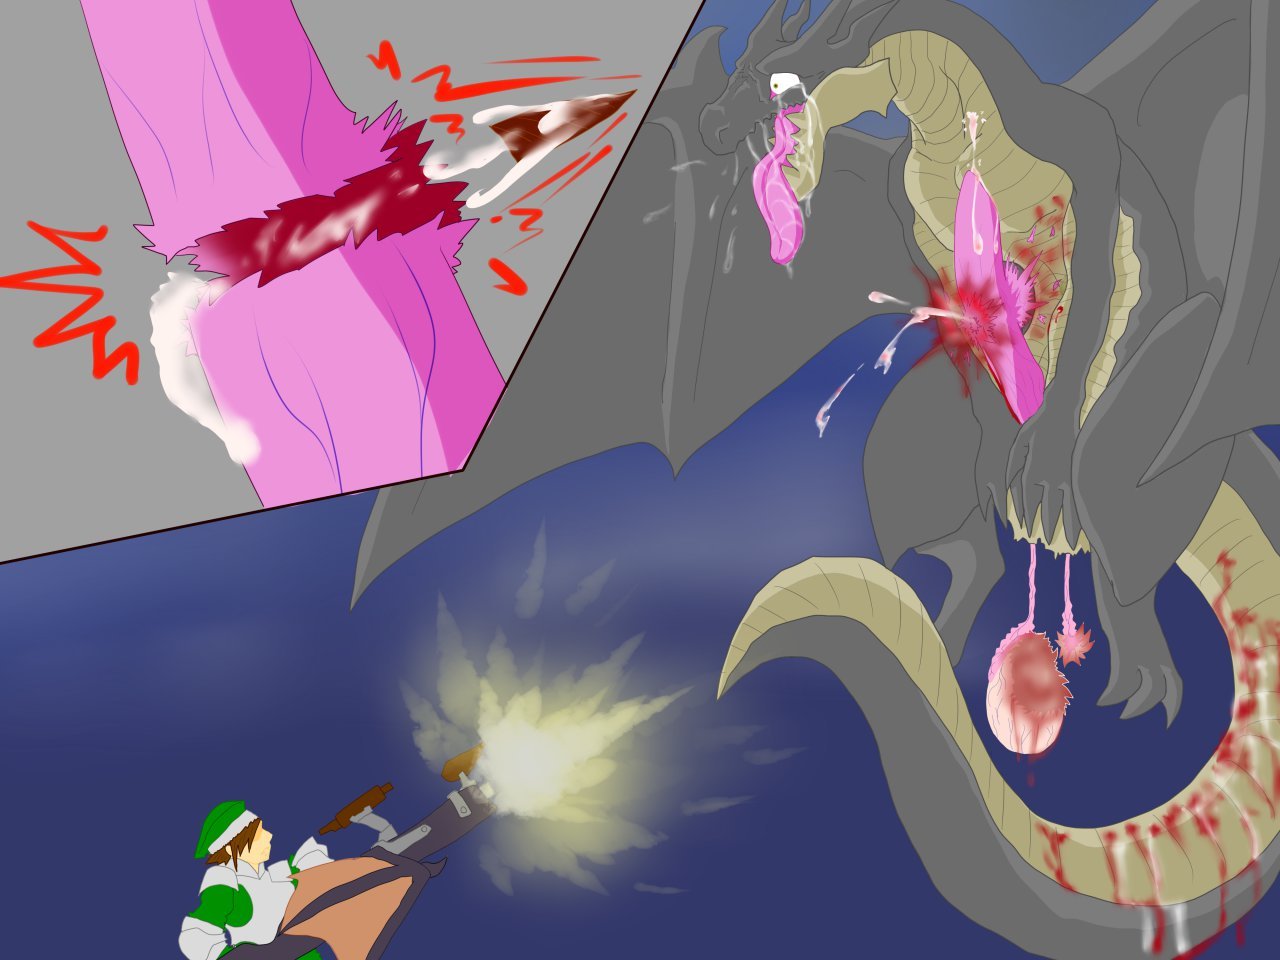 deviljho armor world hunter monster League of legends katarina naked